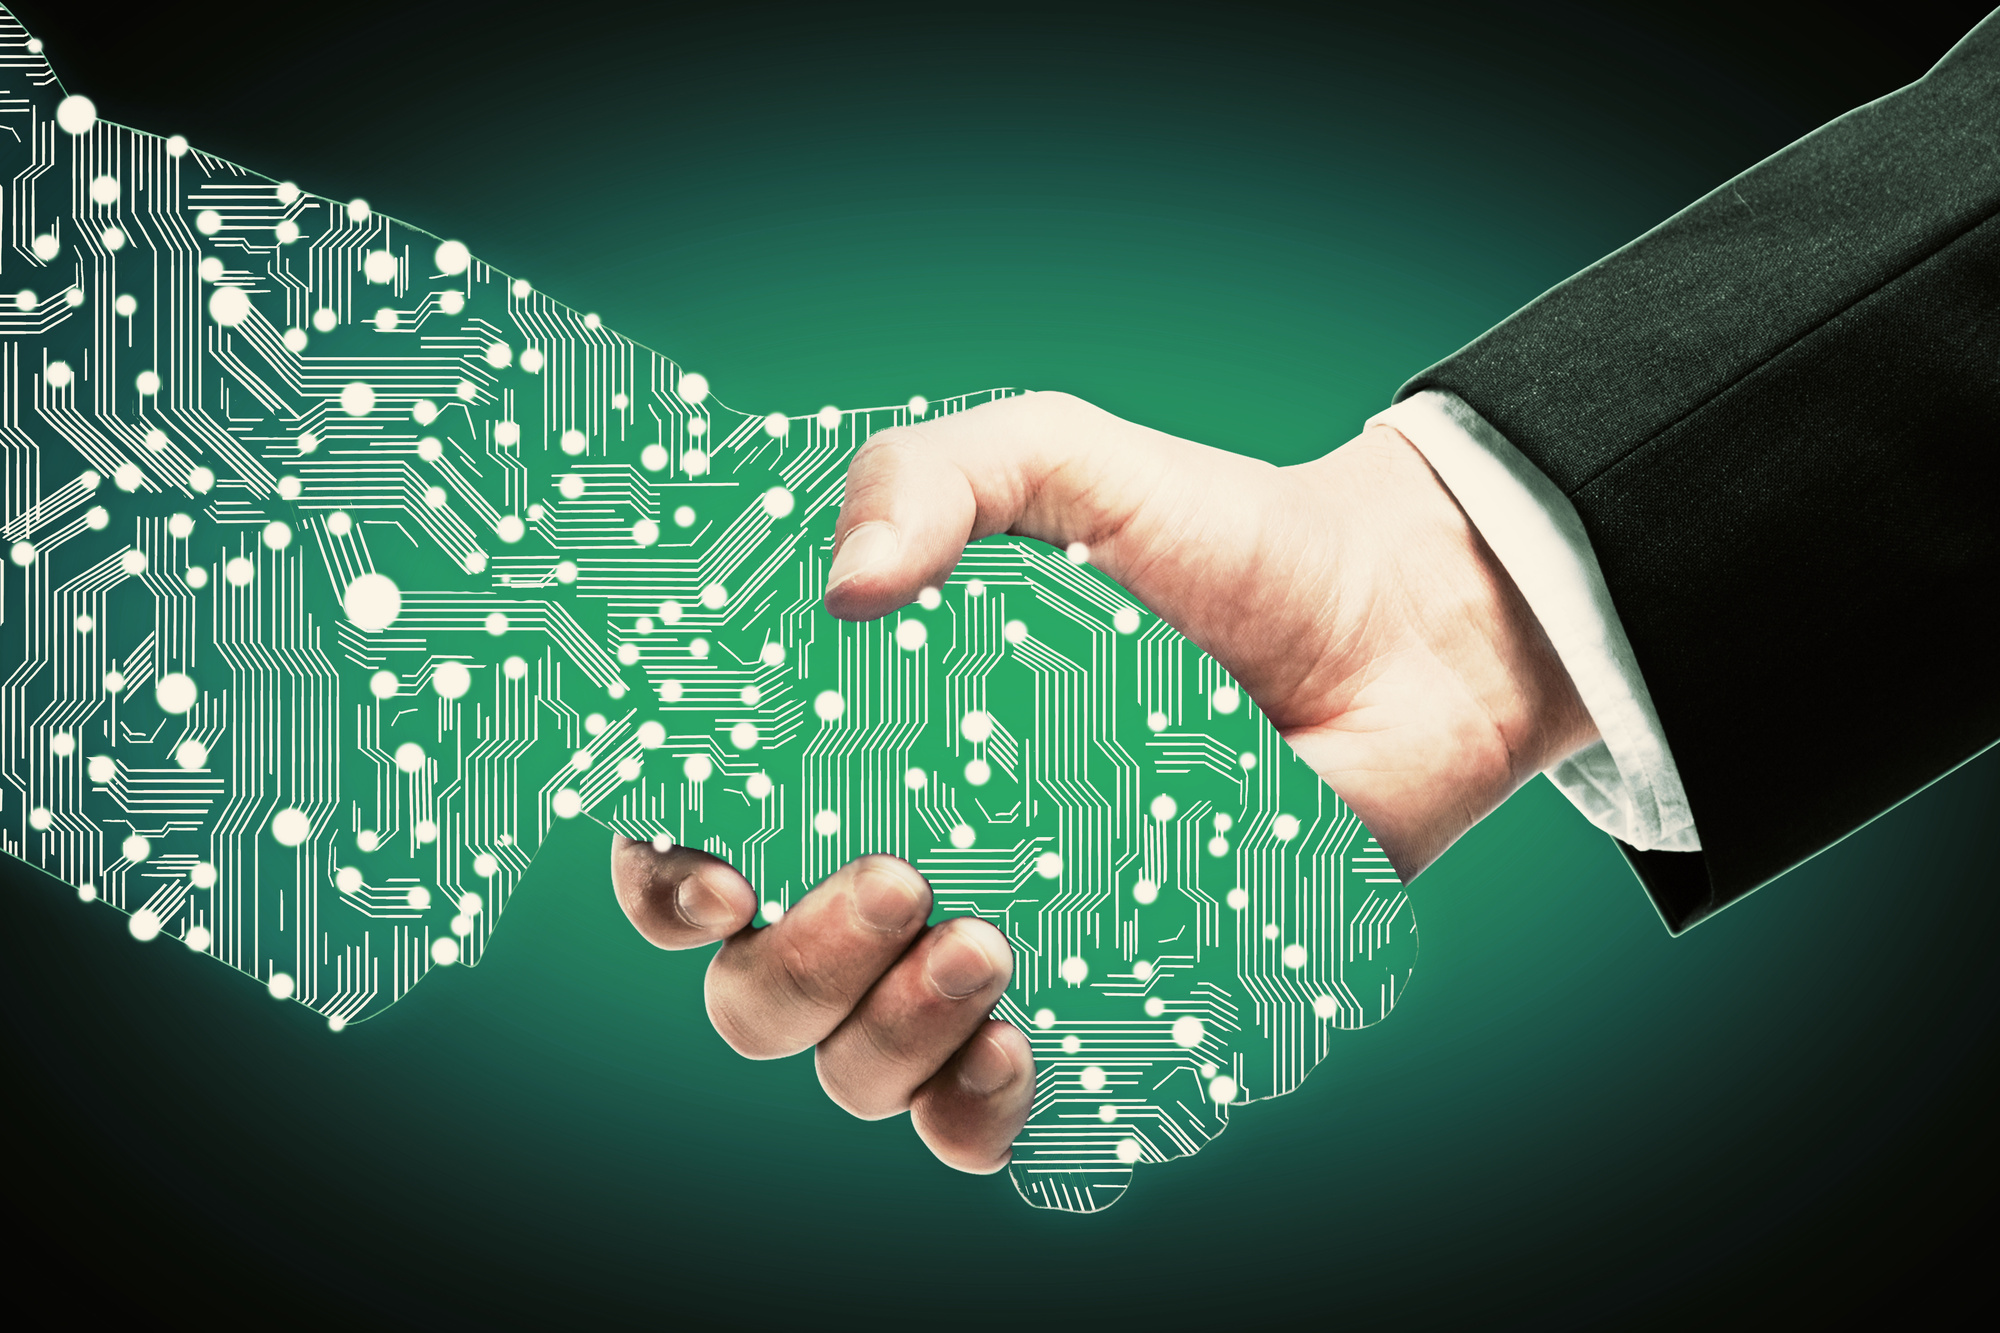 Businessman shaking digital partners hand on green background